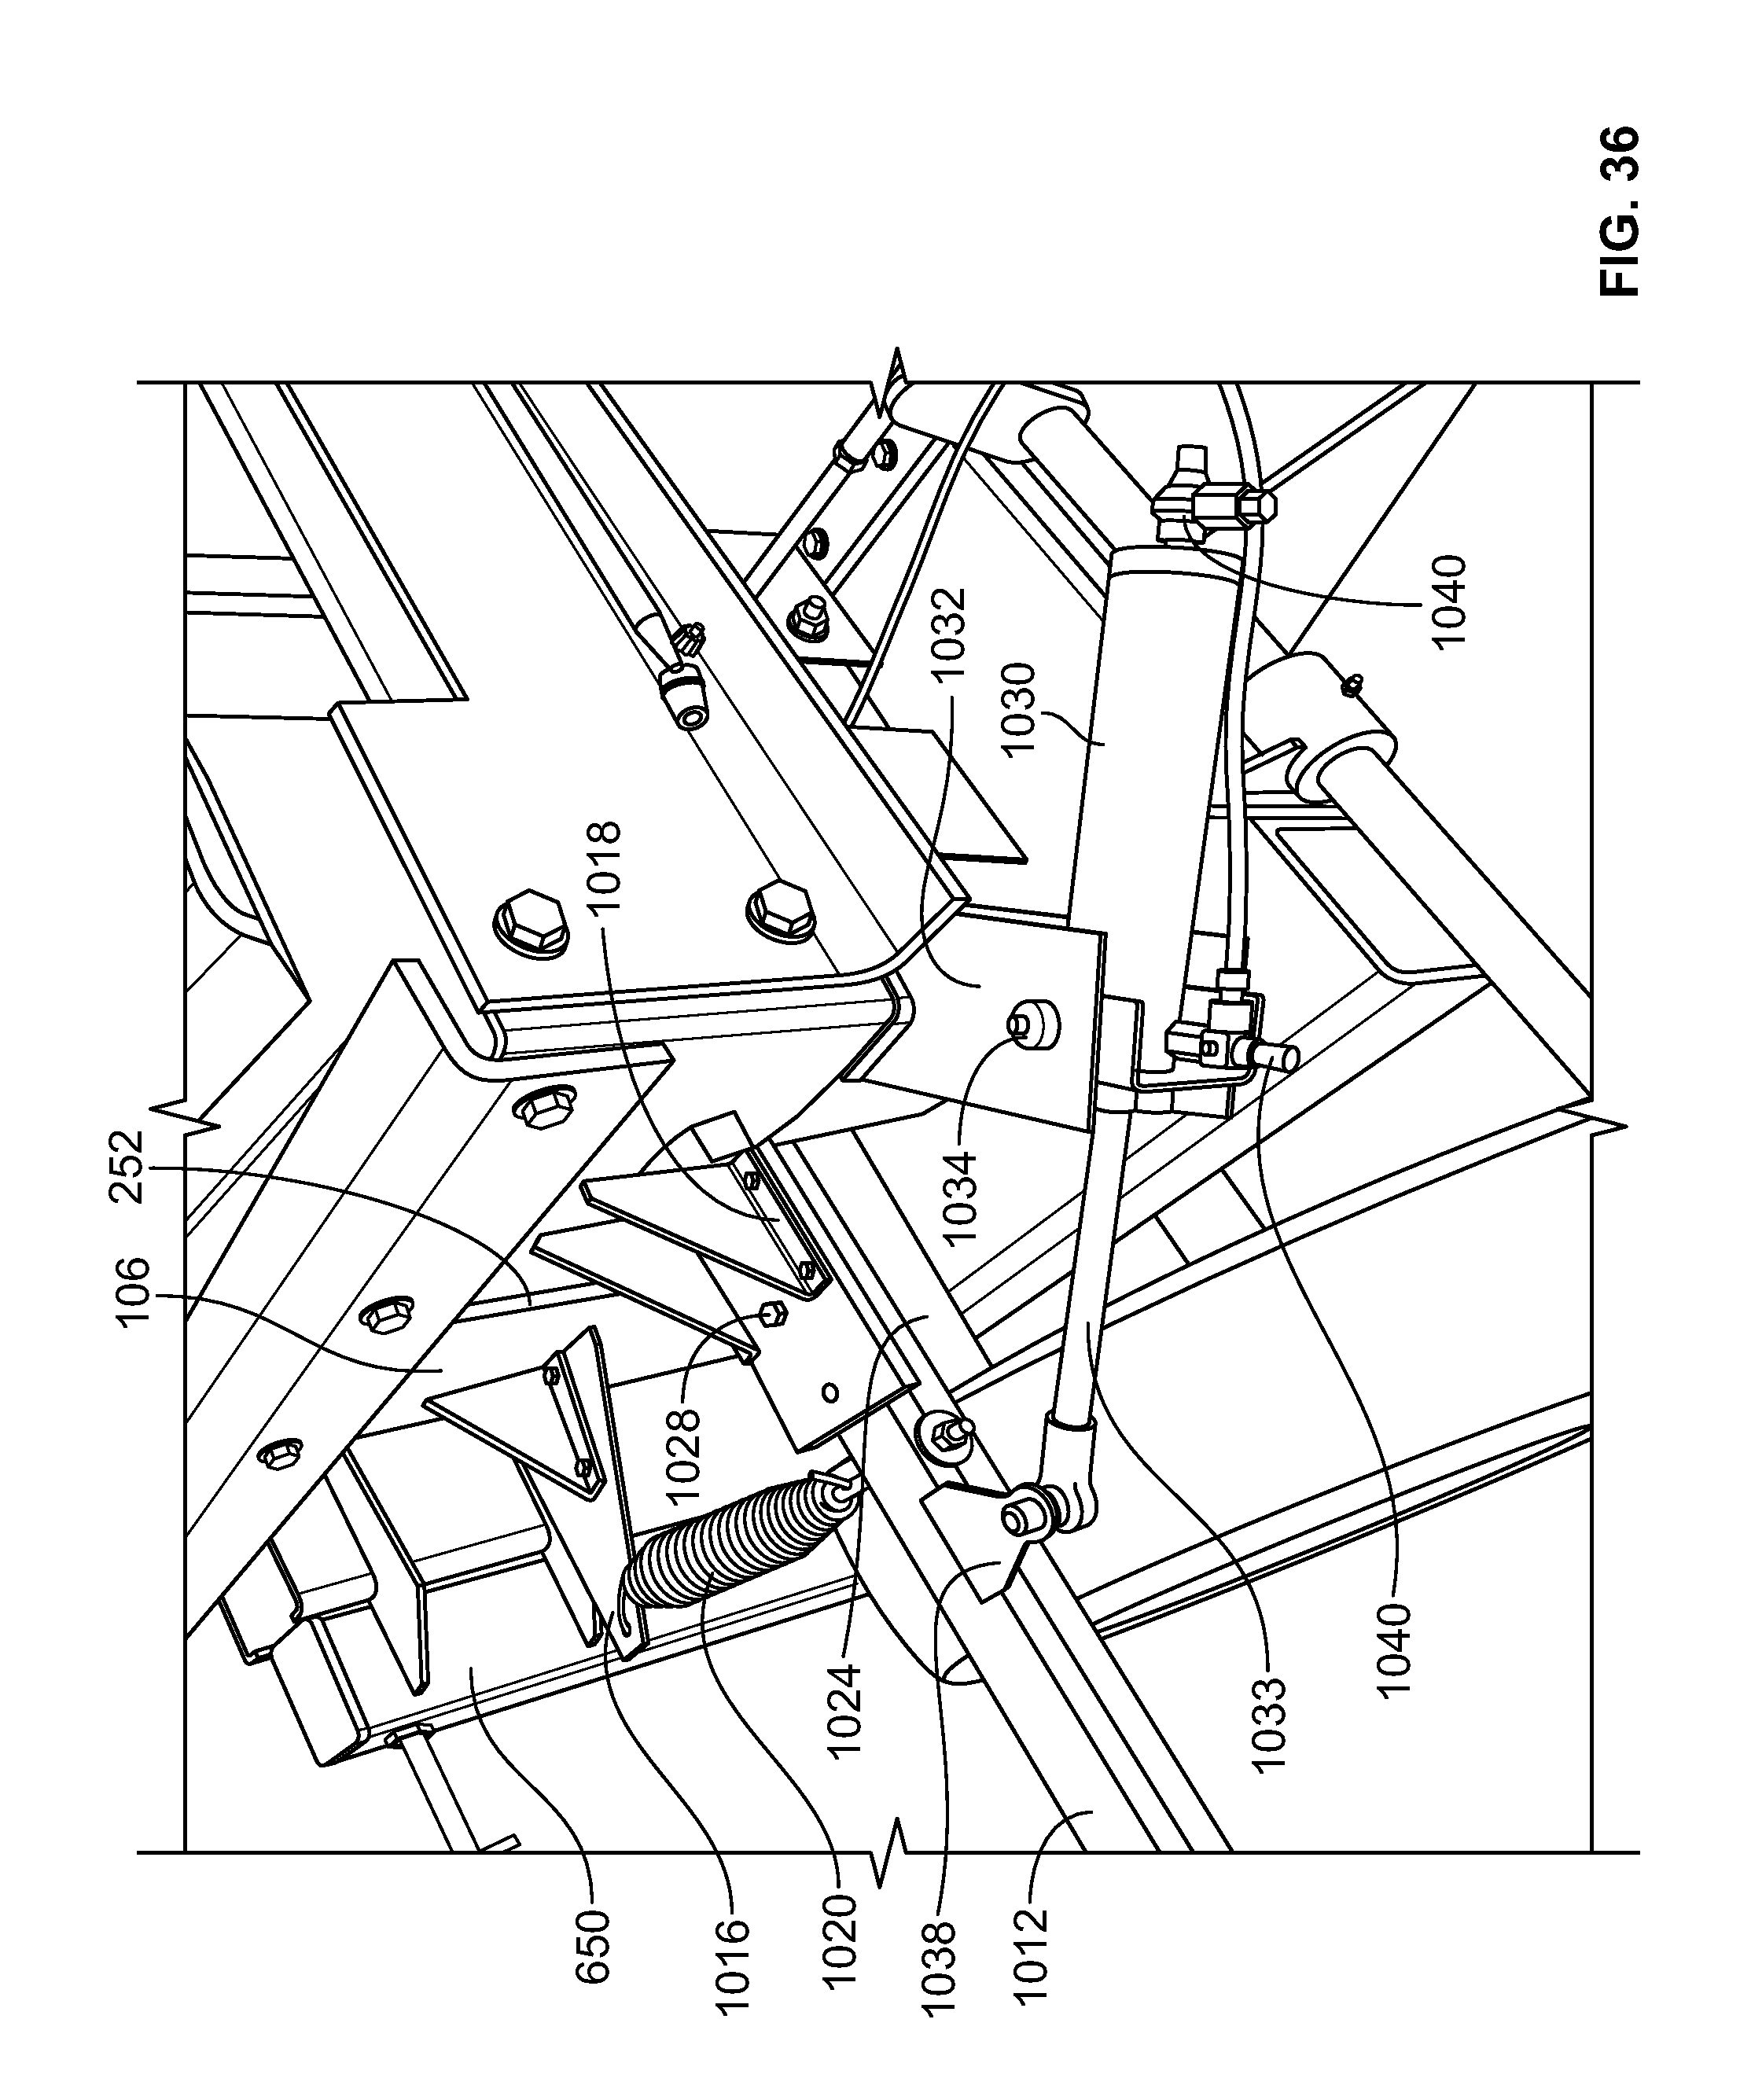 ih 574 wiring harness vyn zaislunamai uk  574 international wiring diagram 574 free engine image for user manual download ih 574 wiring harness ih 784